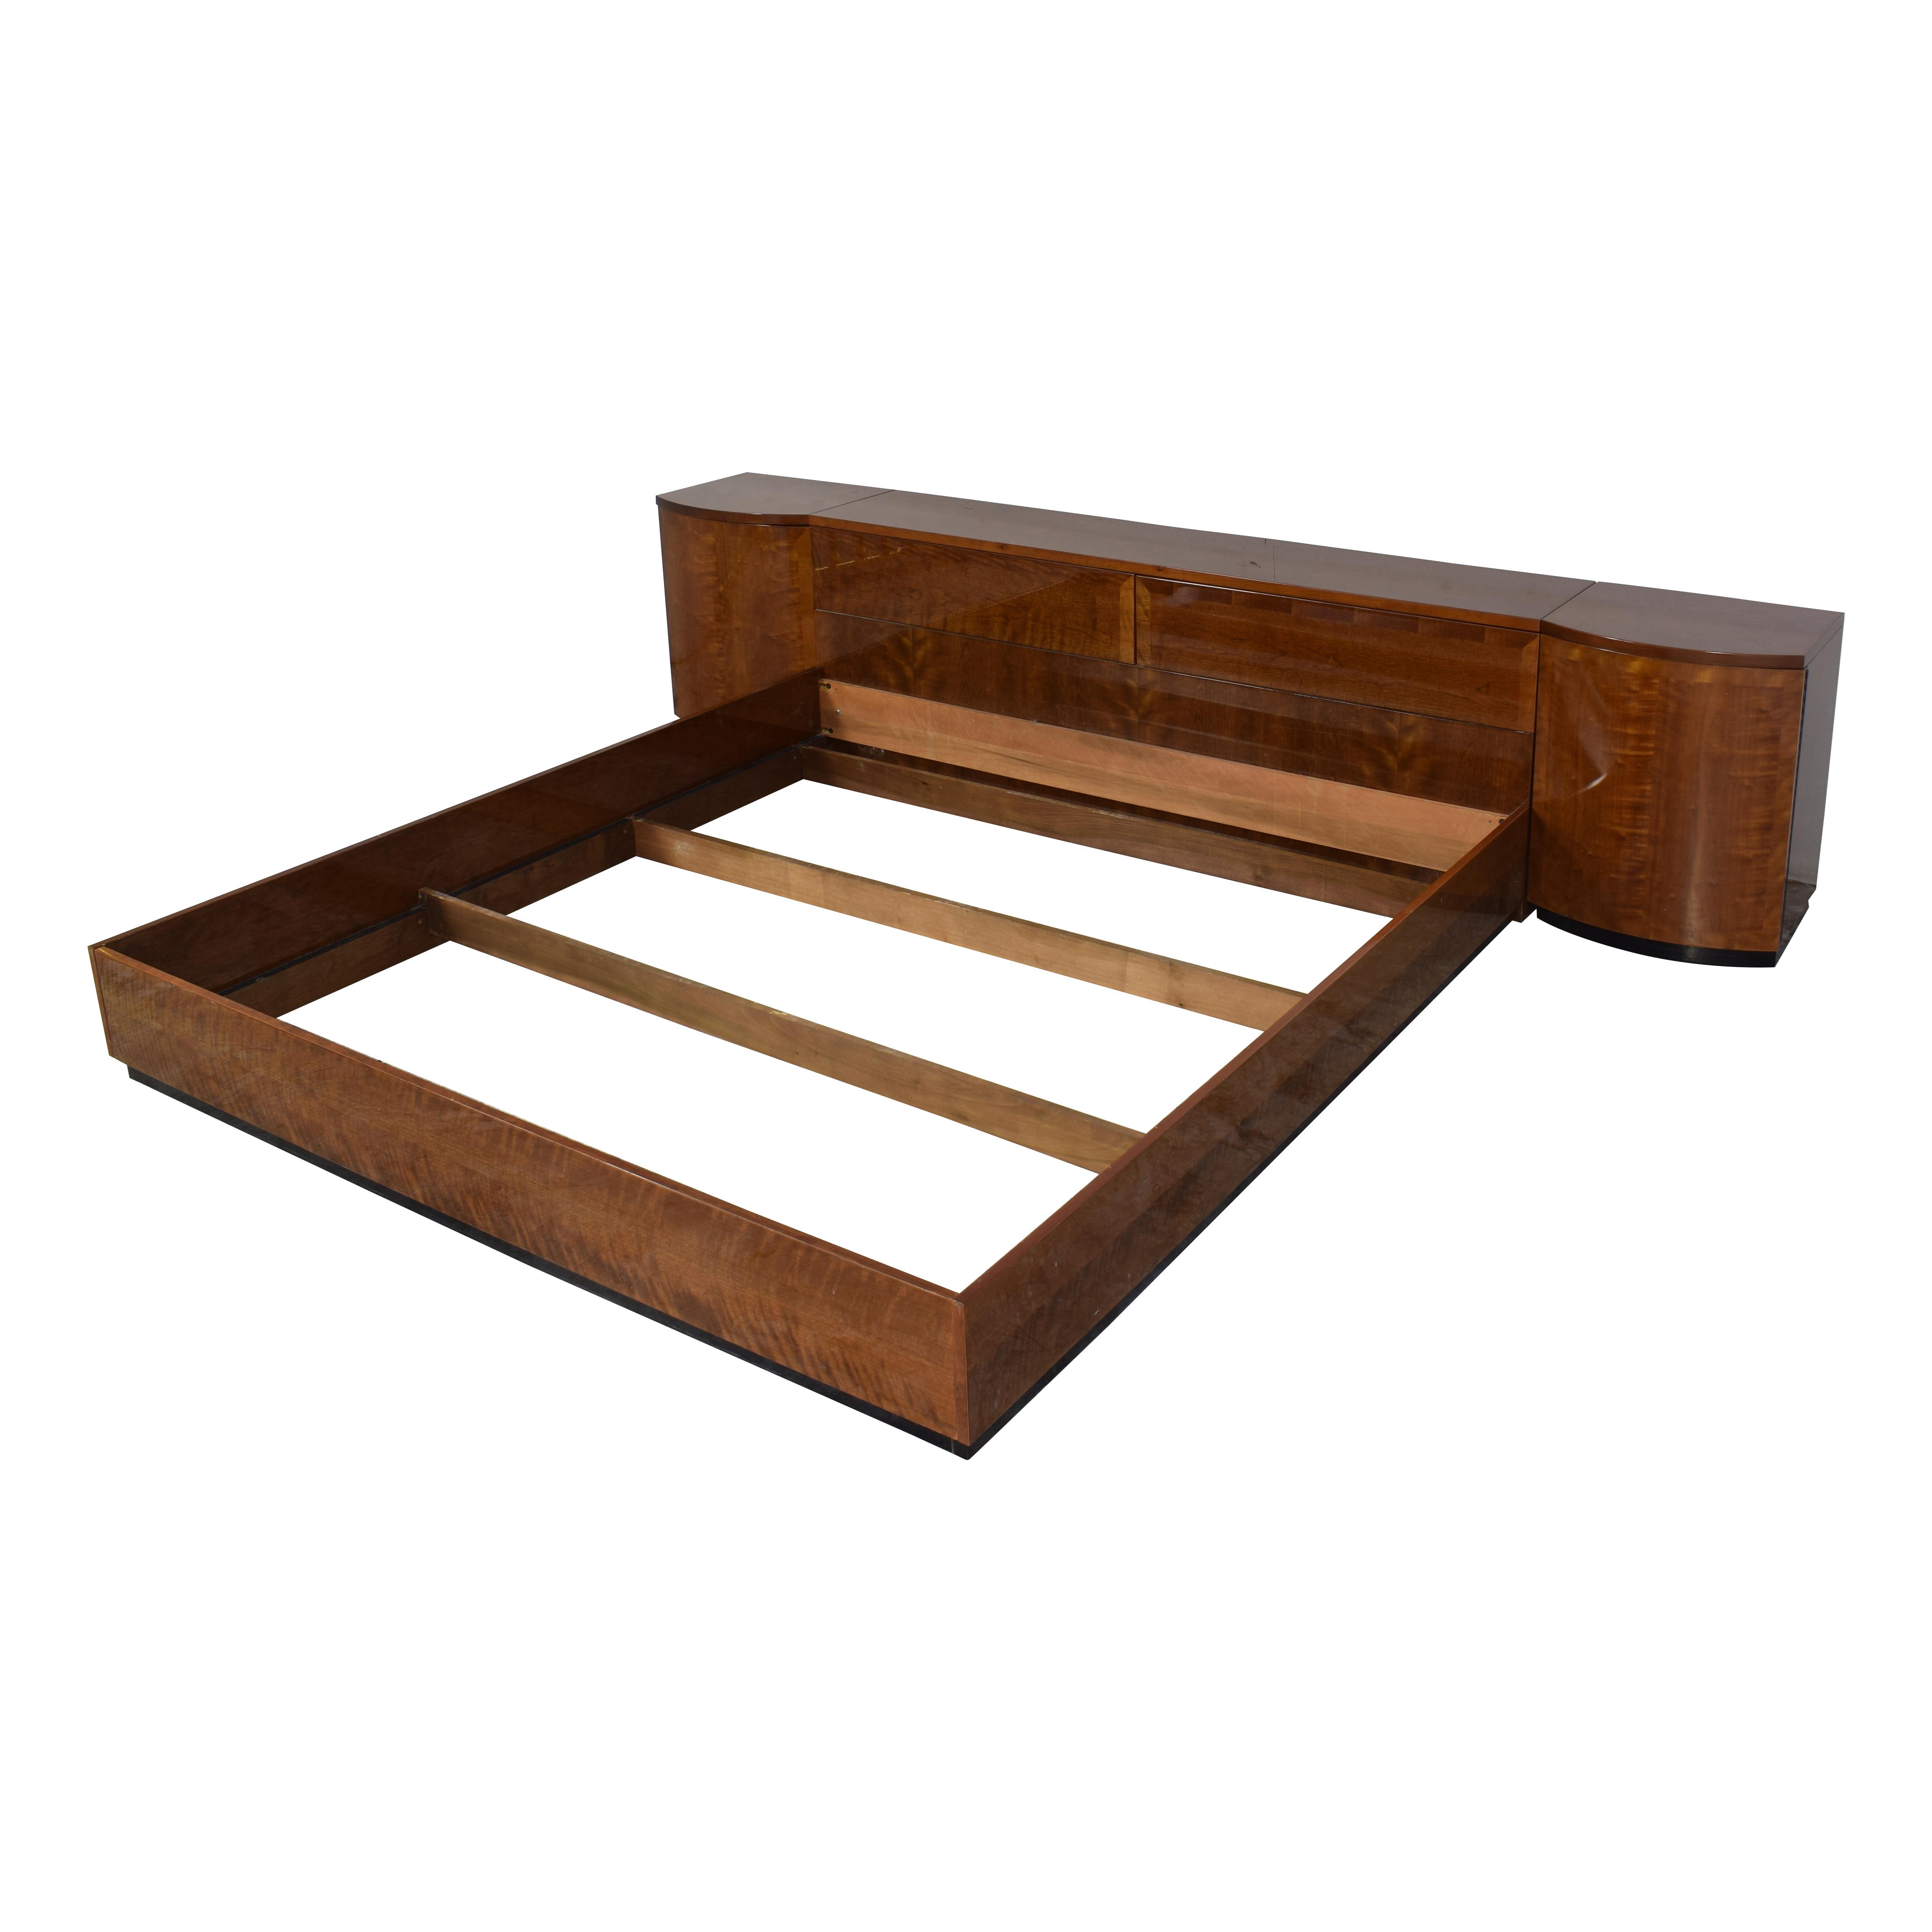 Henredon Furniture Henredon Furniture King Storage Bed with Nightstands brown